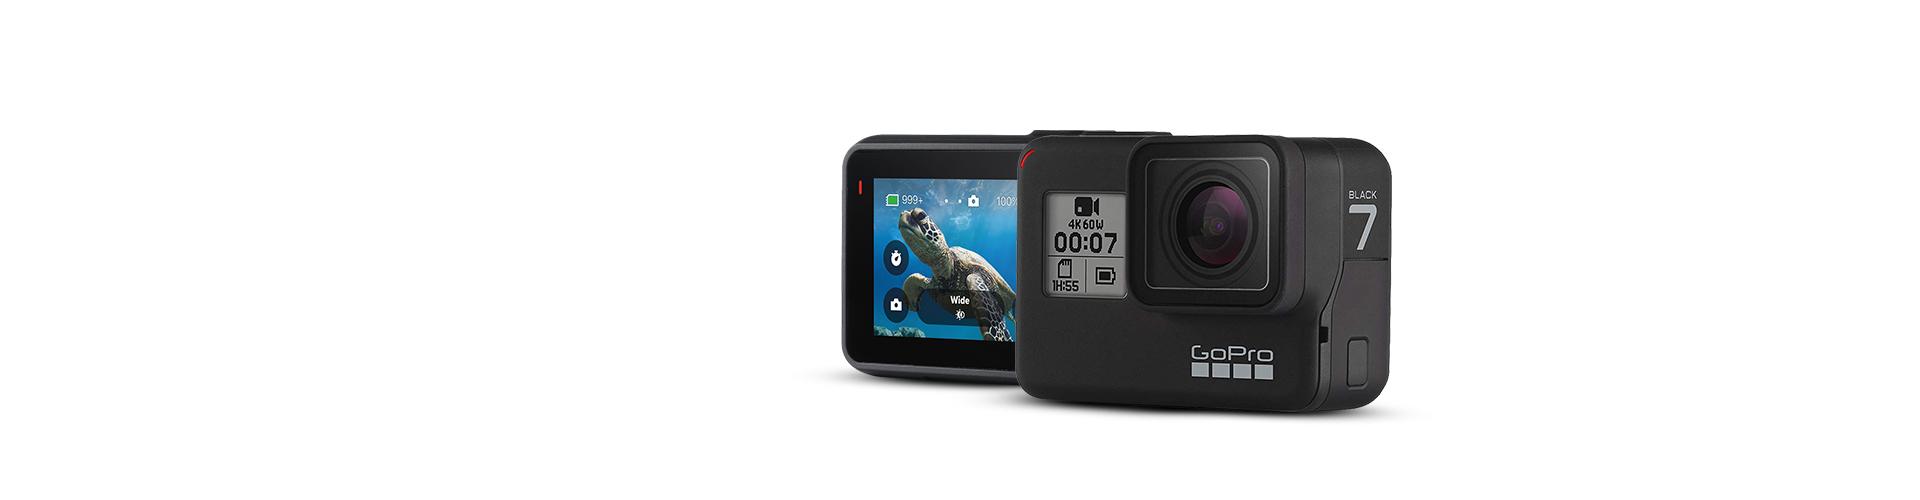 fed3e1d657d Mobile Store Ecuador - Compra online tu Smartphone ideal